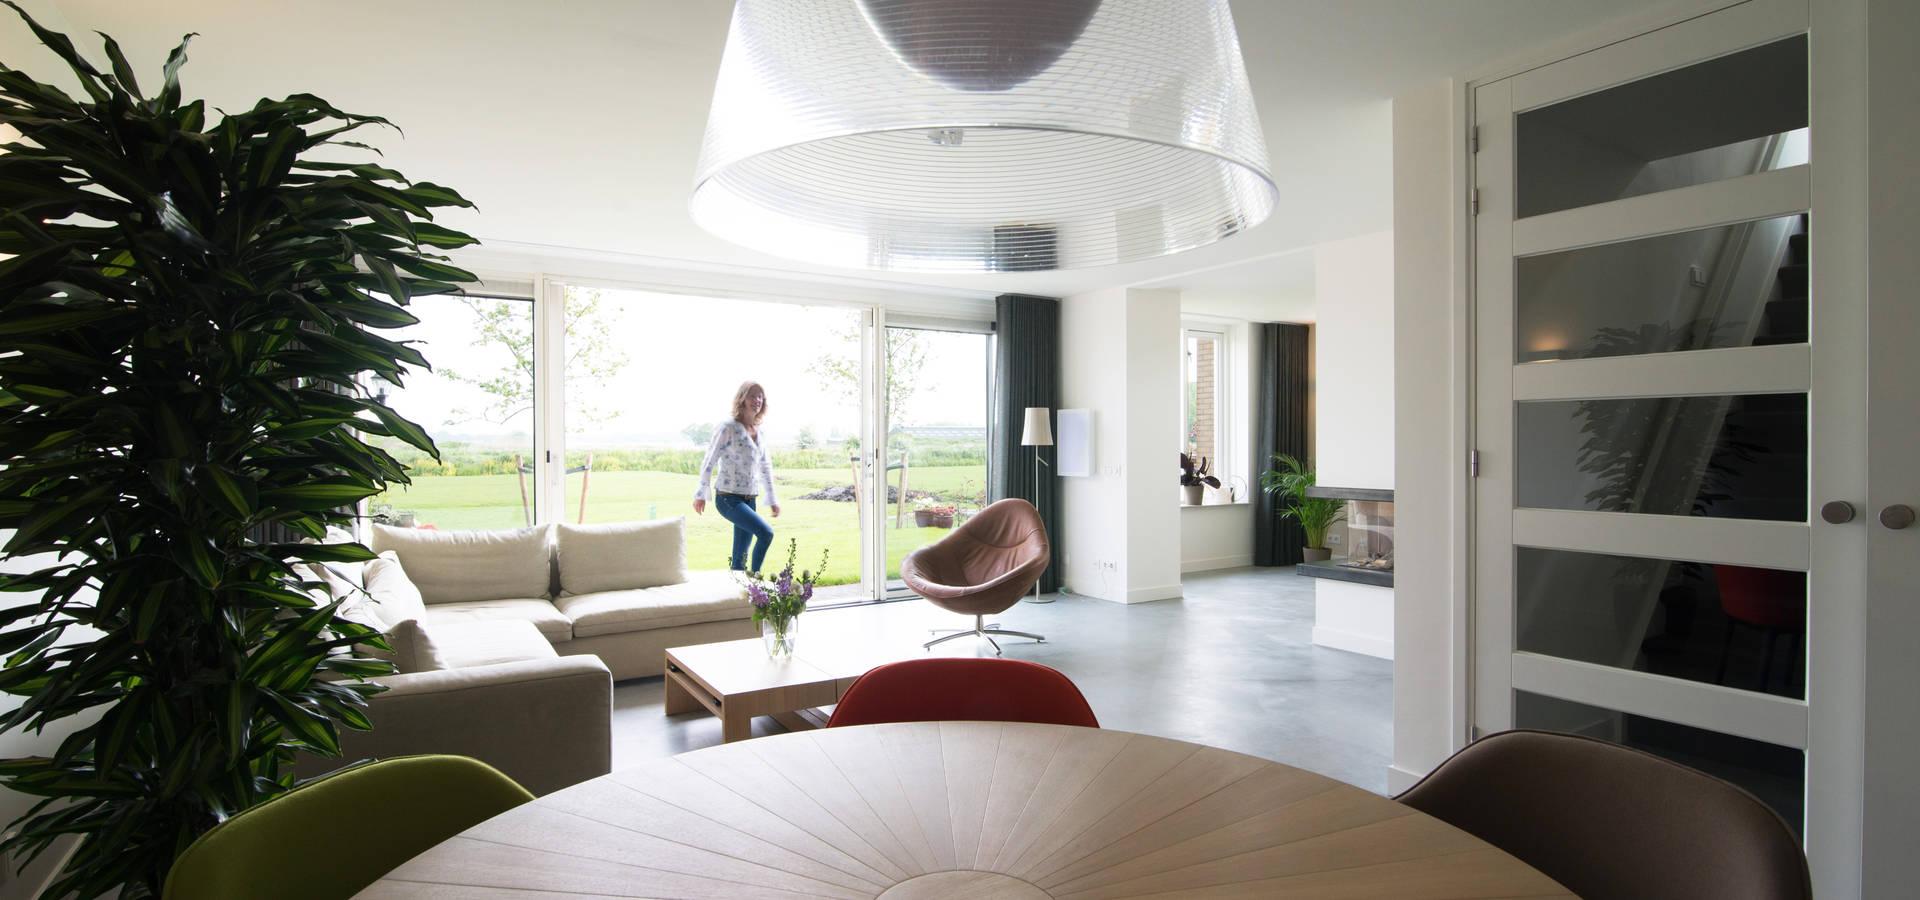 Egbert Duijn architect+